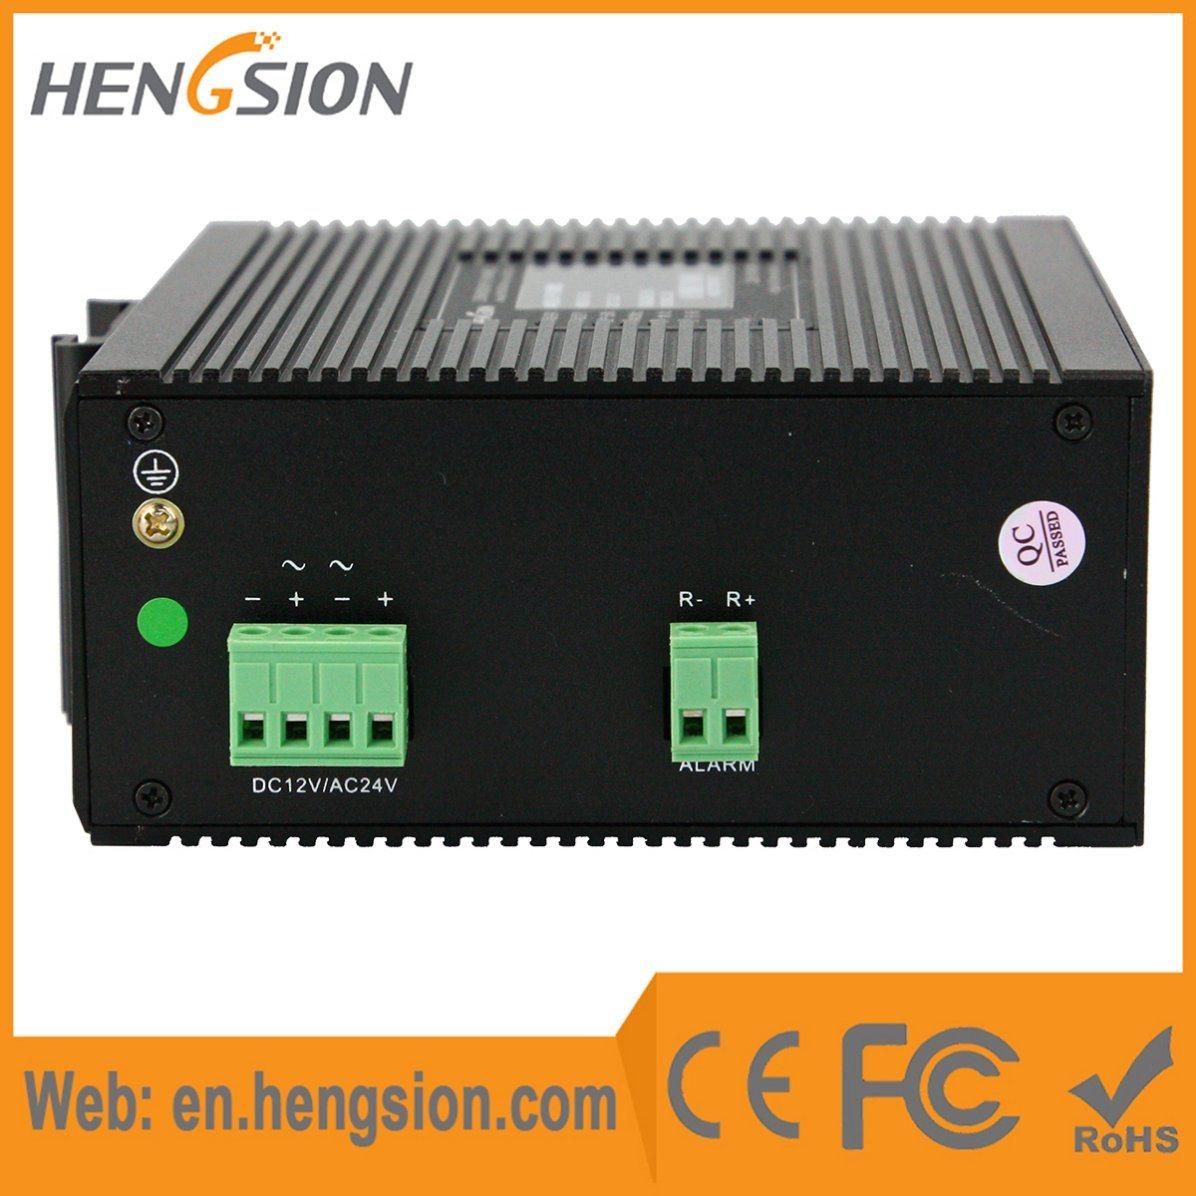 8 Megabit and 2 Gigabit Tx Industrial Ethernet Network Switch